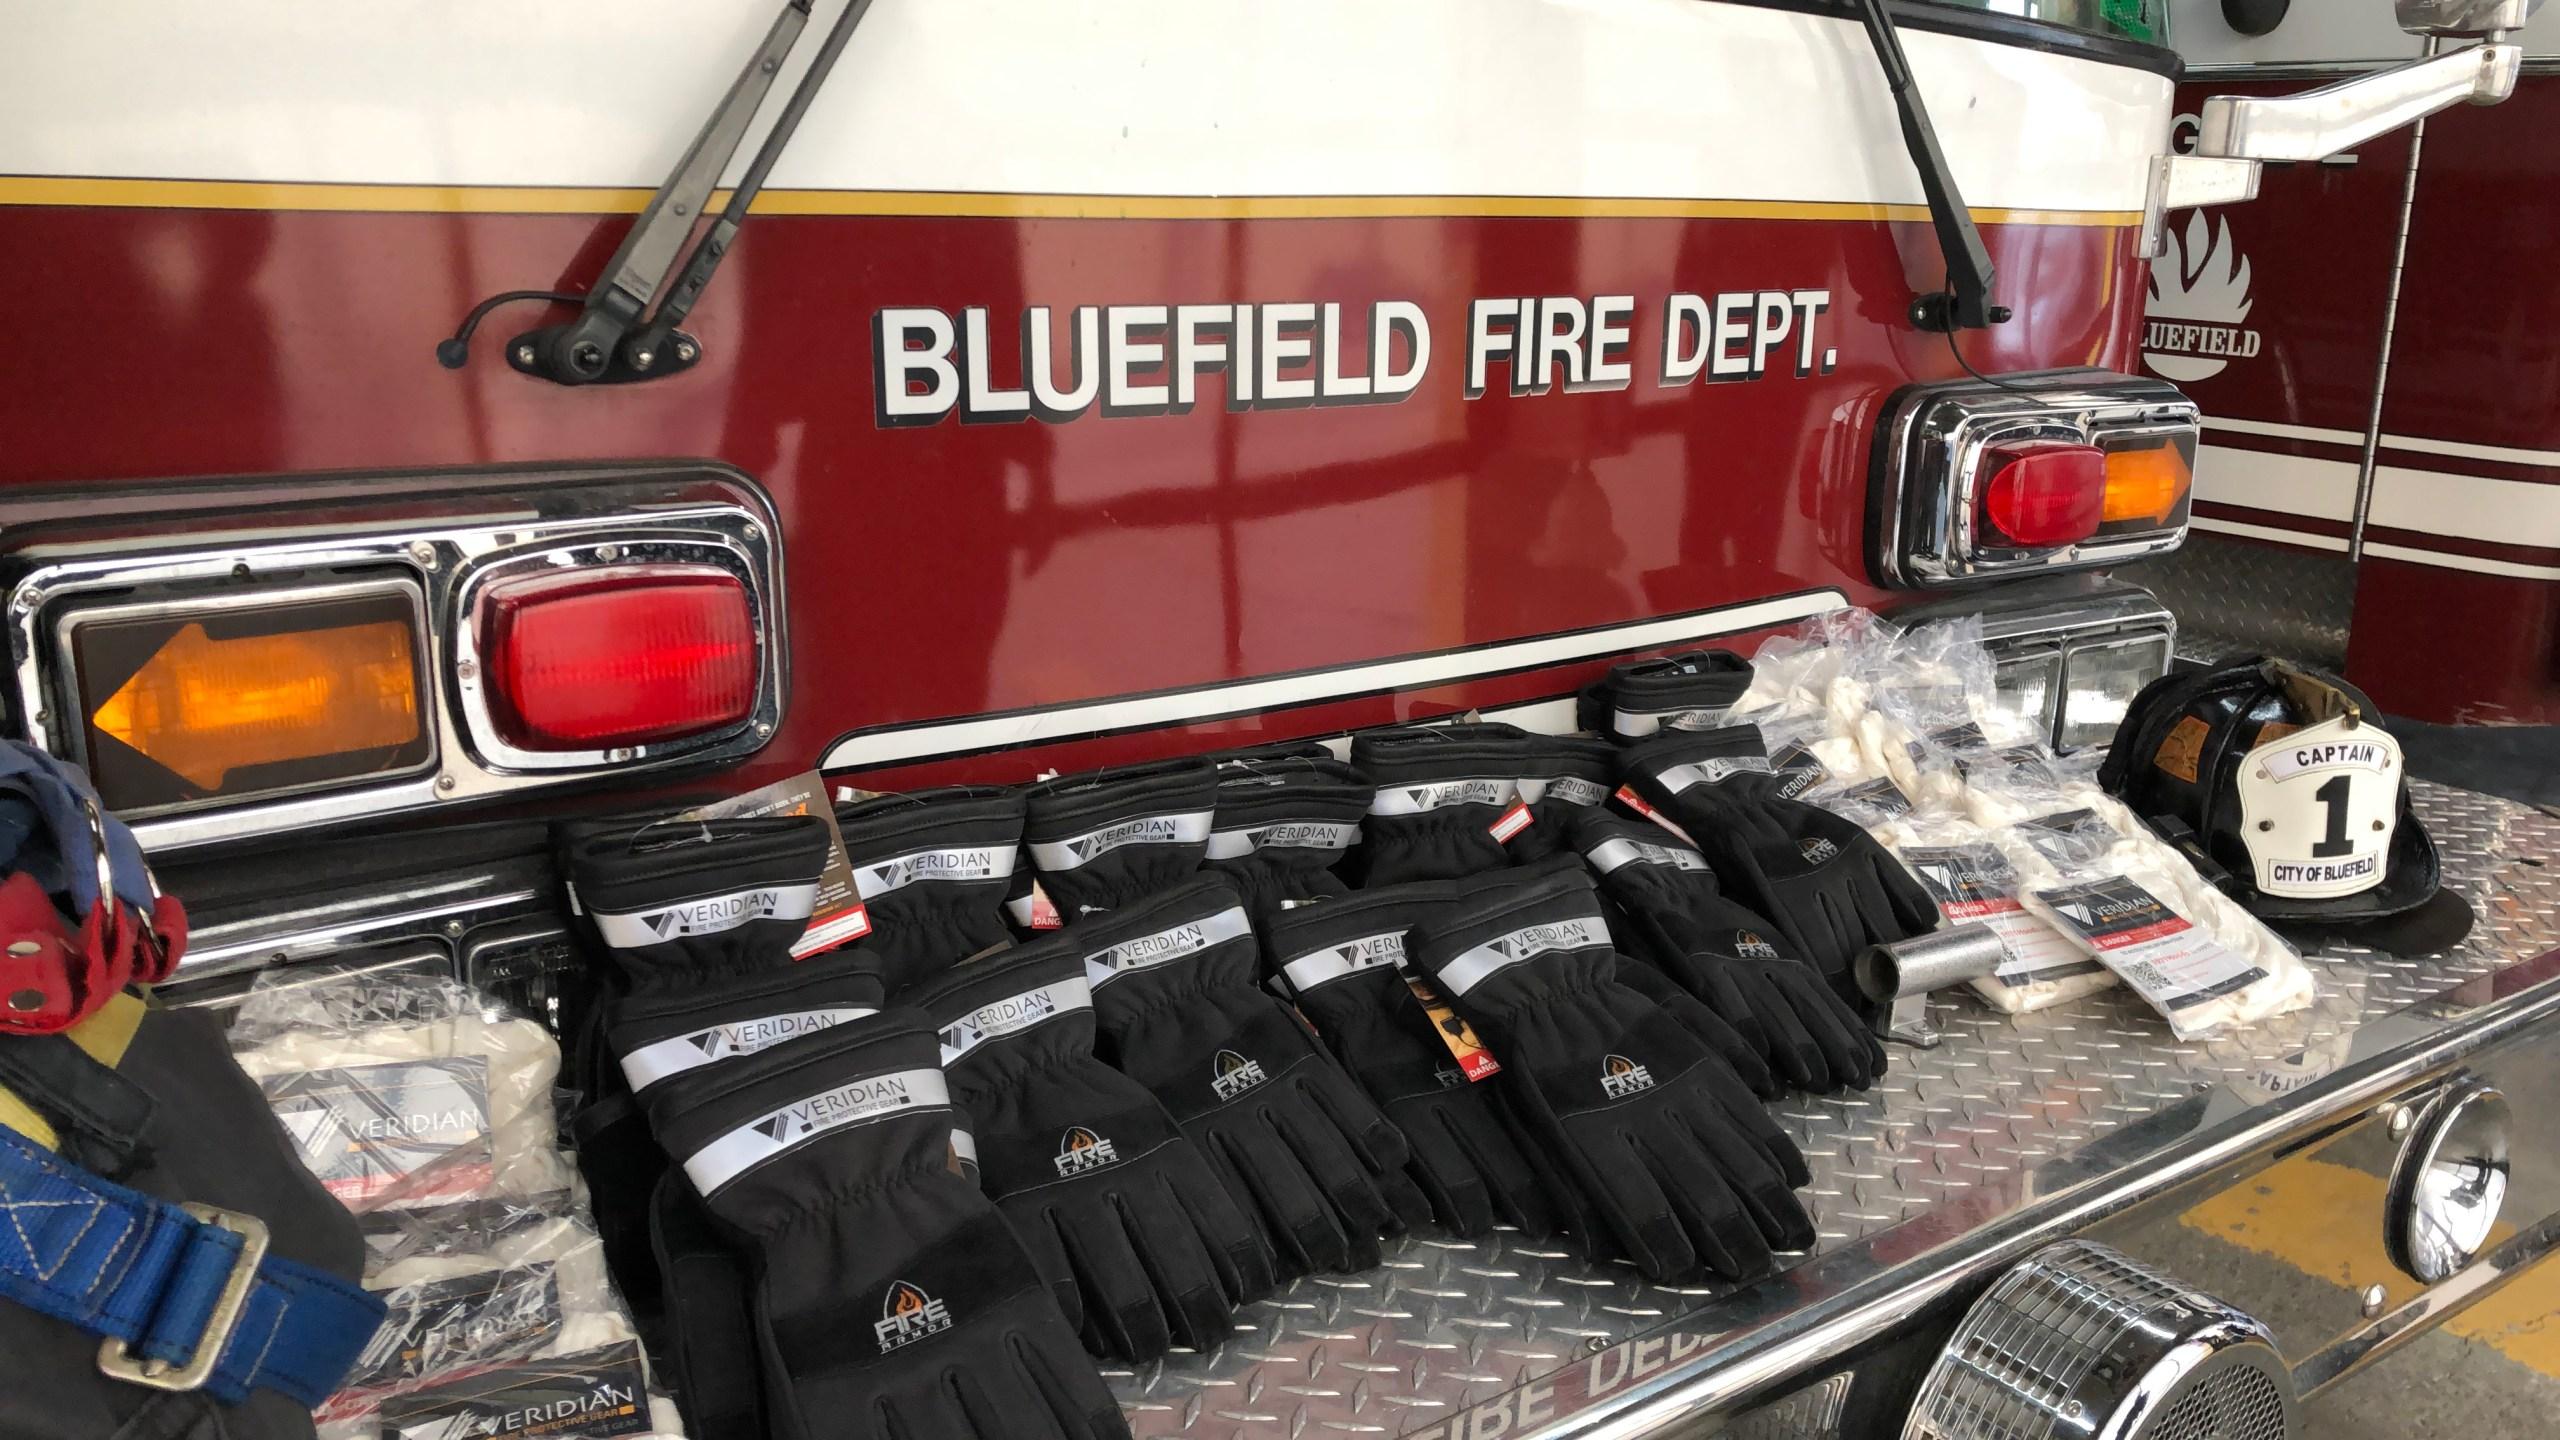 Ethel N. Bowen Foundation donation to Bluefield Fire Dept_1550588308441.JPG.jpg